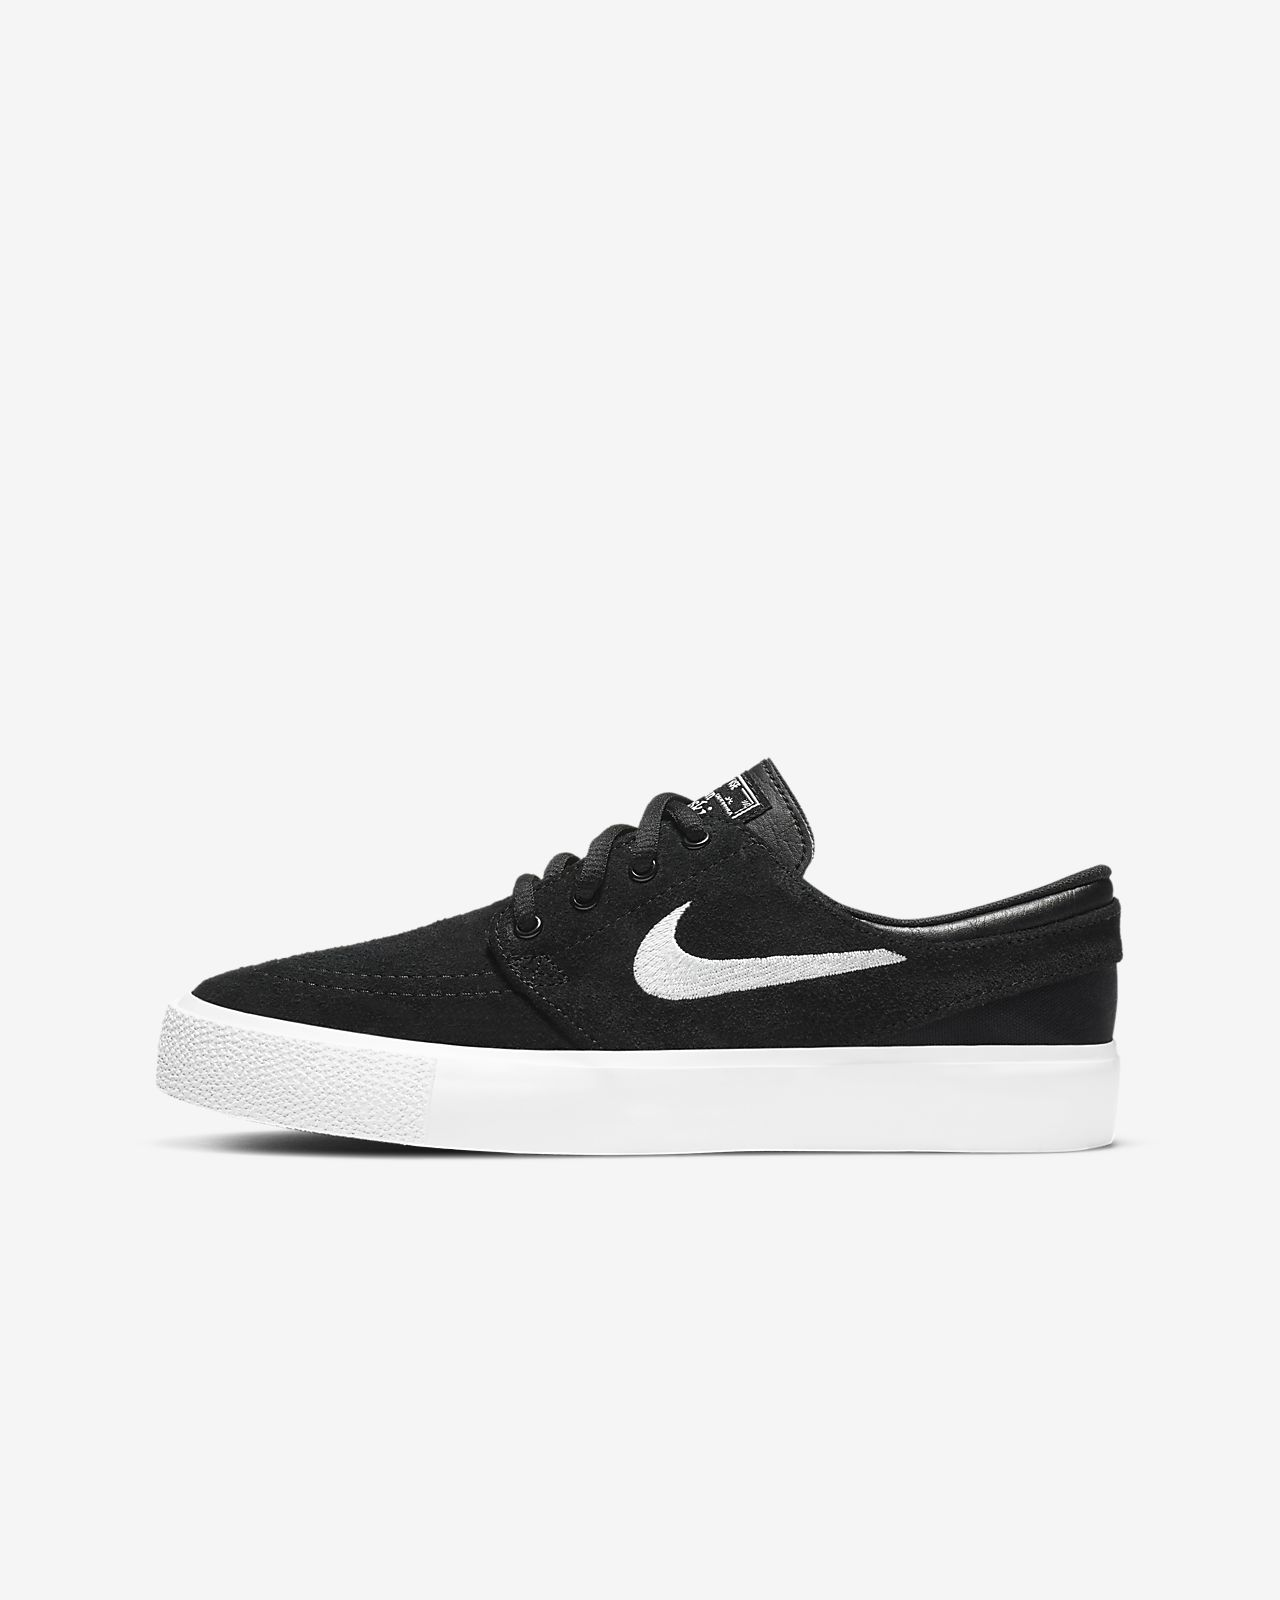 Nike SB Stefan Janoski Sabatilles de skateboard - Nen/a